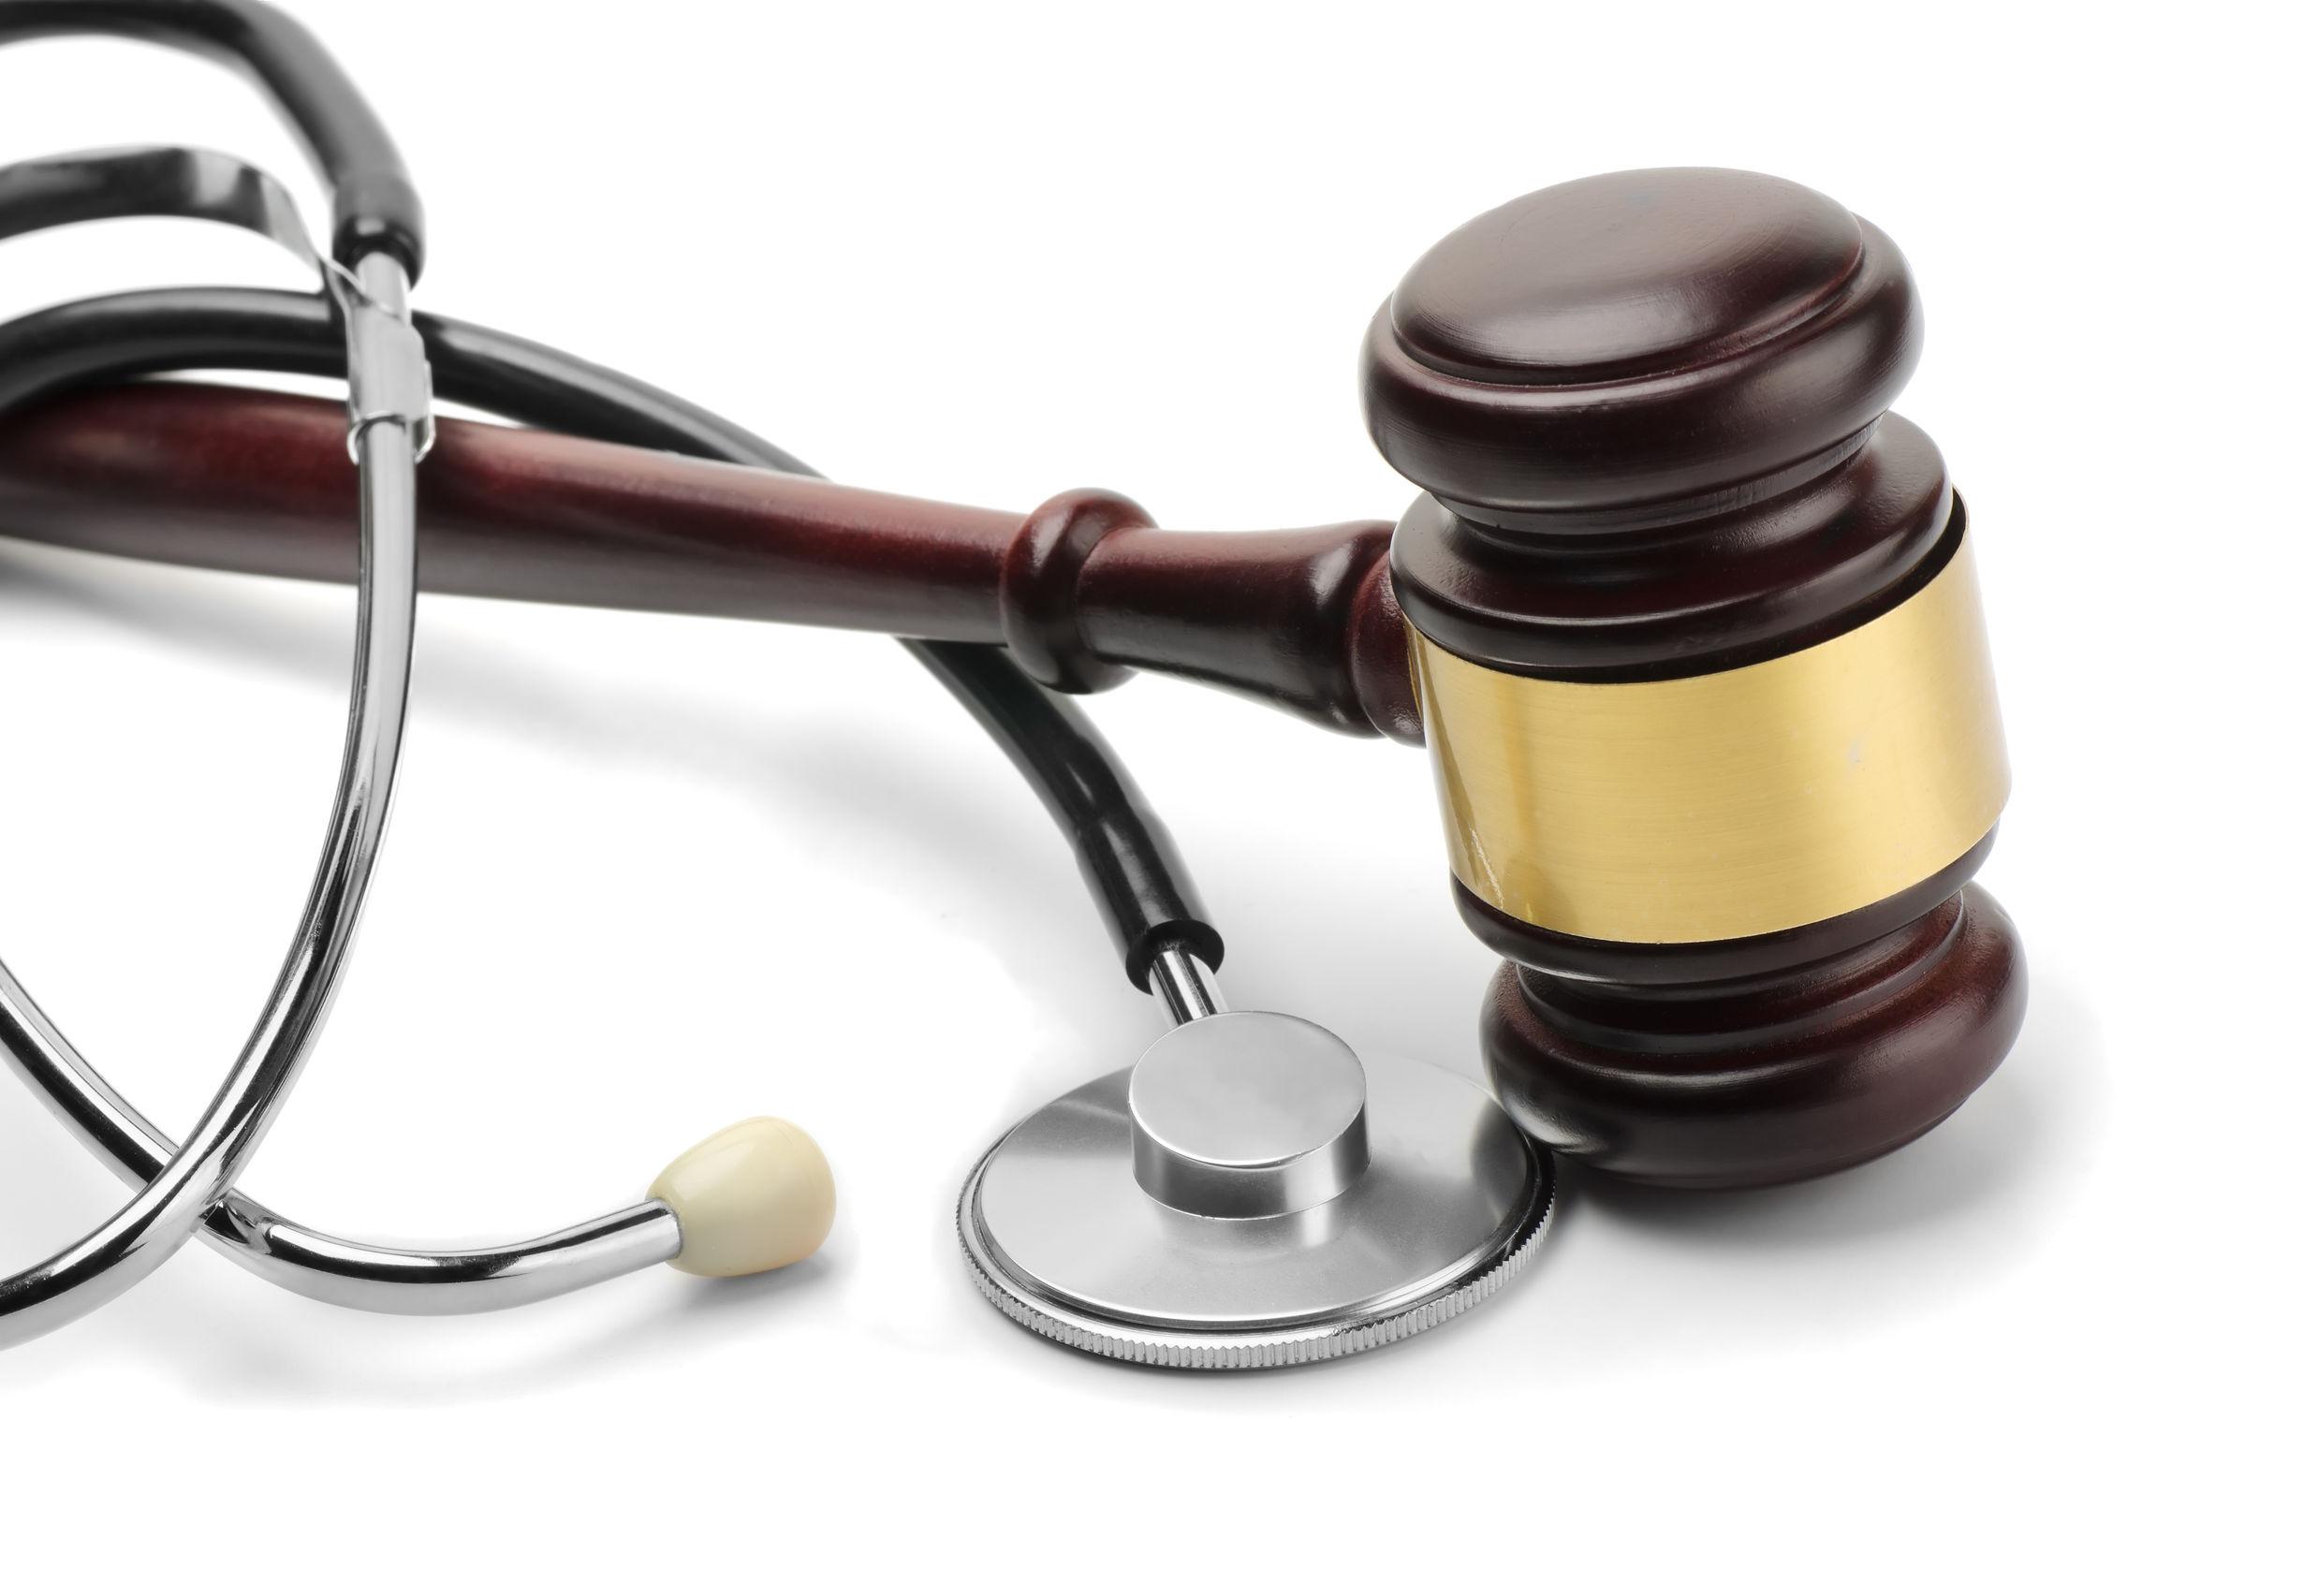 MEDICAL MALPRACTICE INVESTIGATIONS